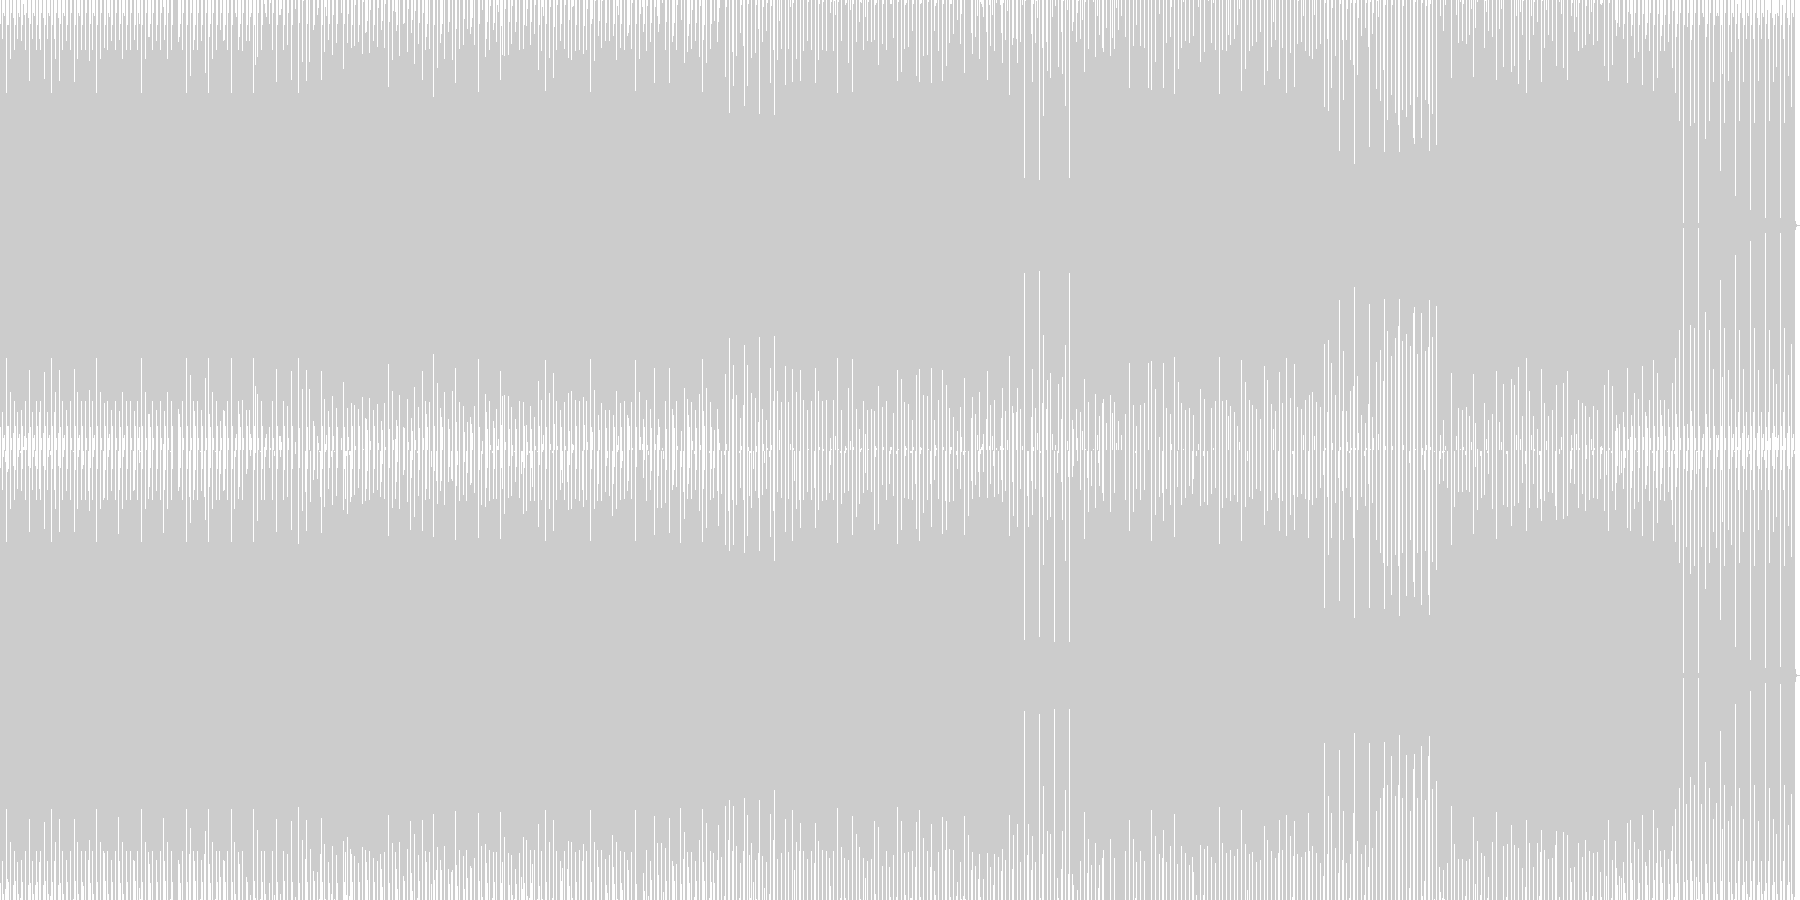 minimal house 25の未再生の波形